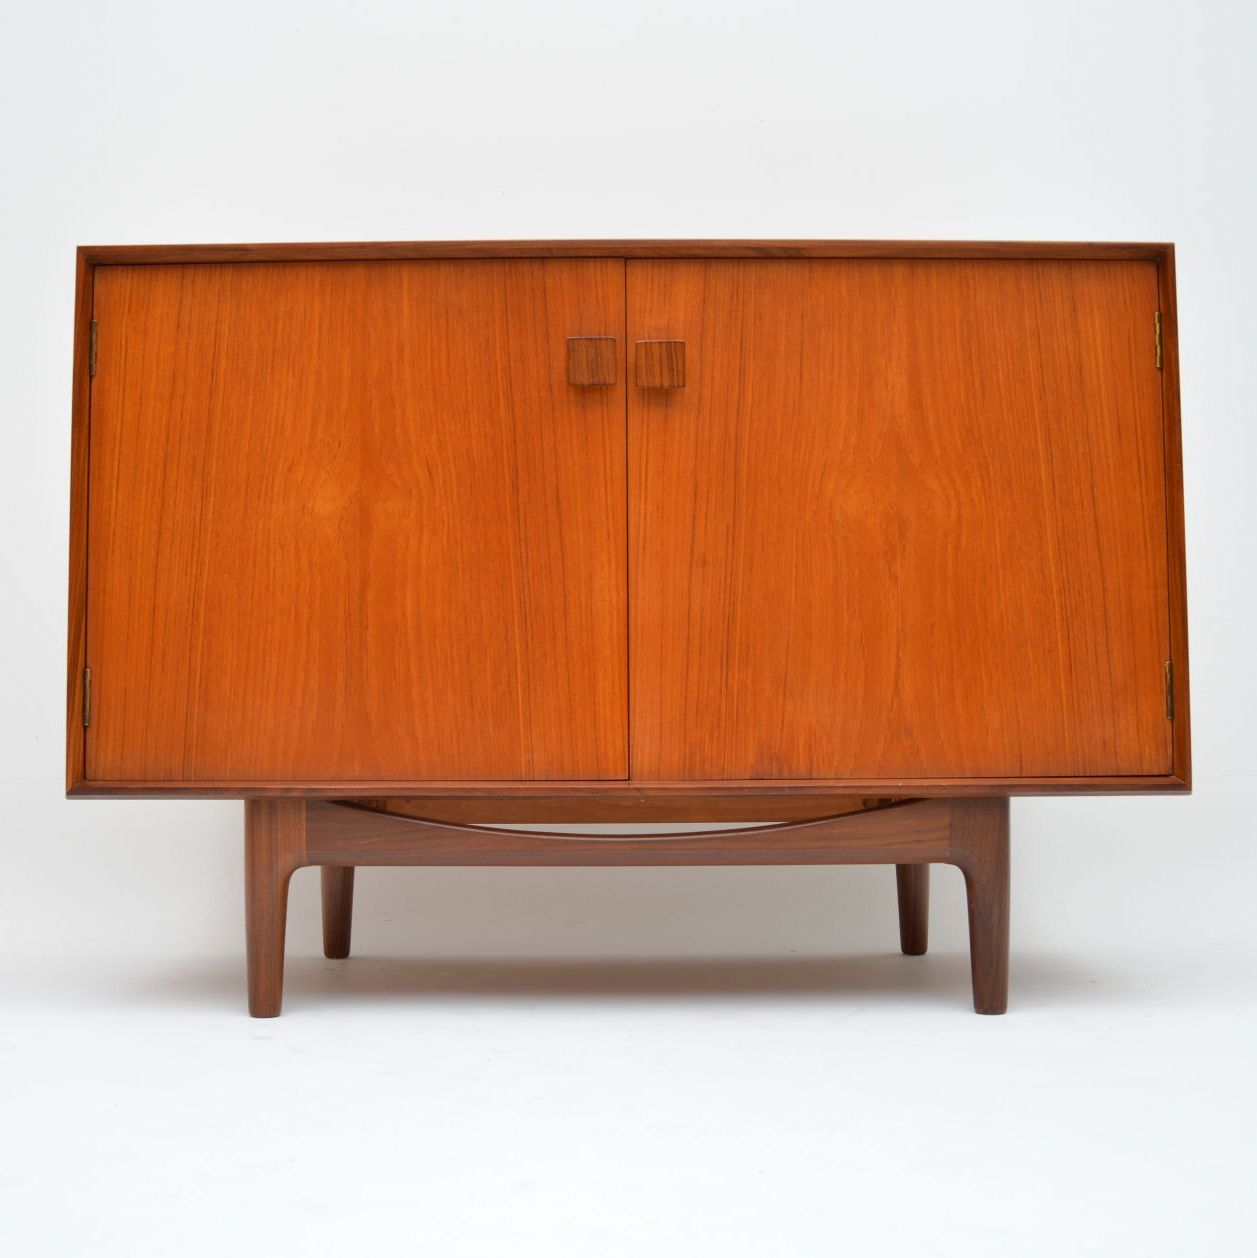 danish_teak_sideboard_cabinet_kofod_larsen_1